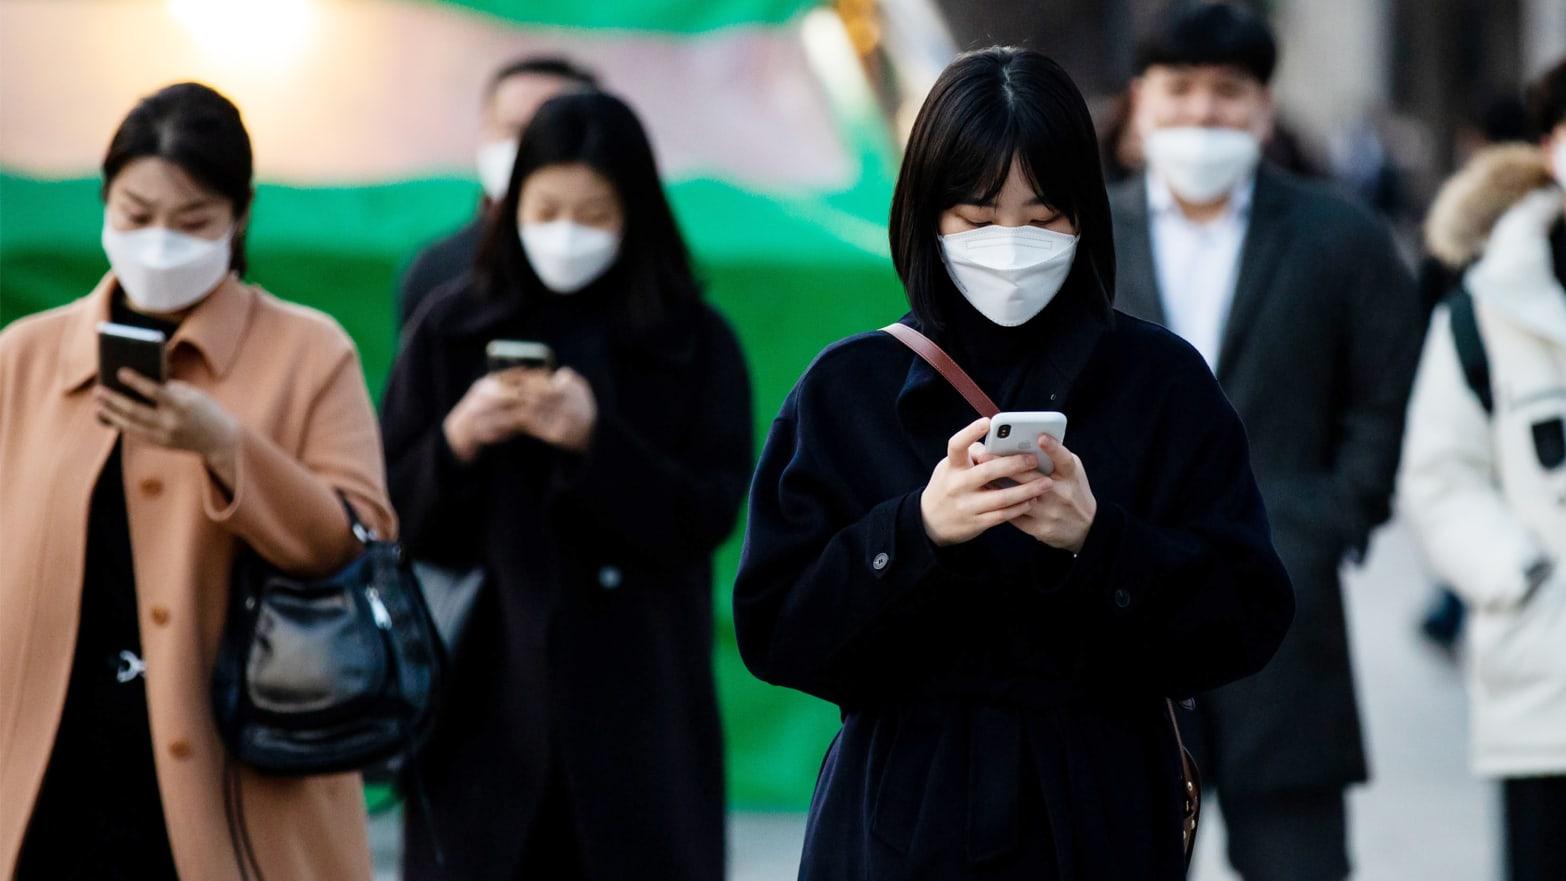 South Korea's Creepy Coronavirus Cellphone Alerts May Be Too Much ...